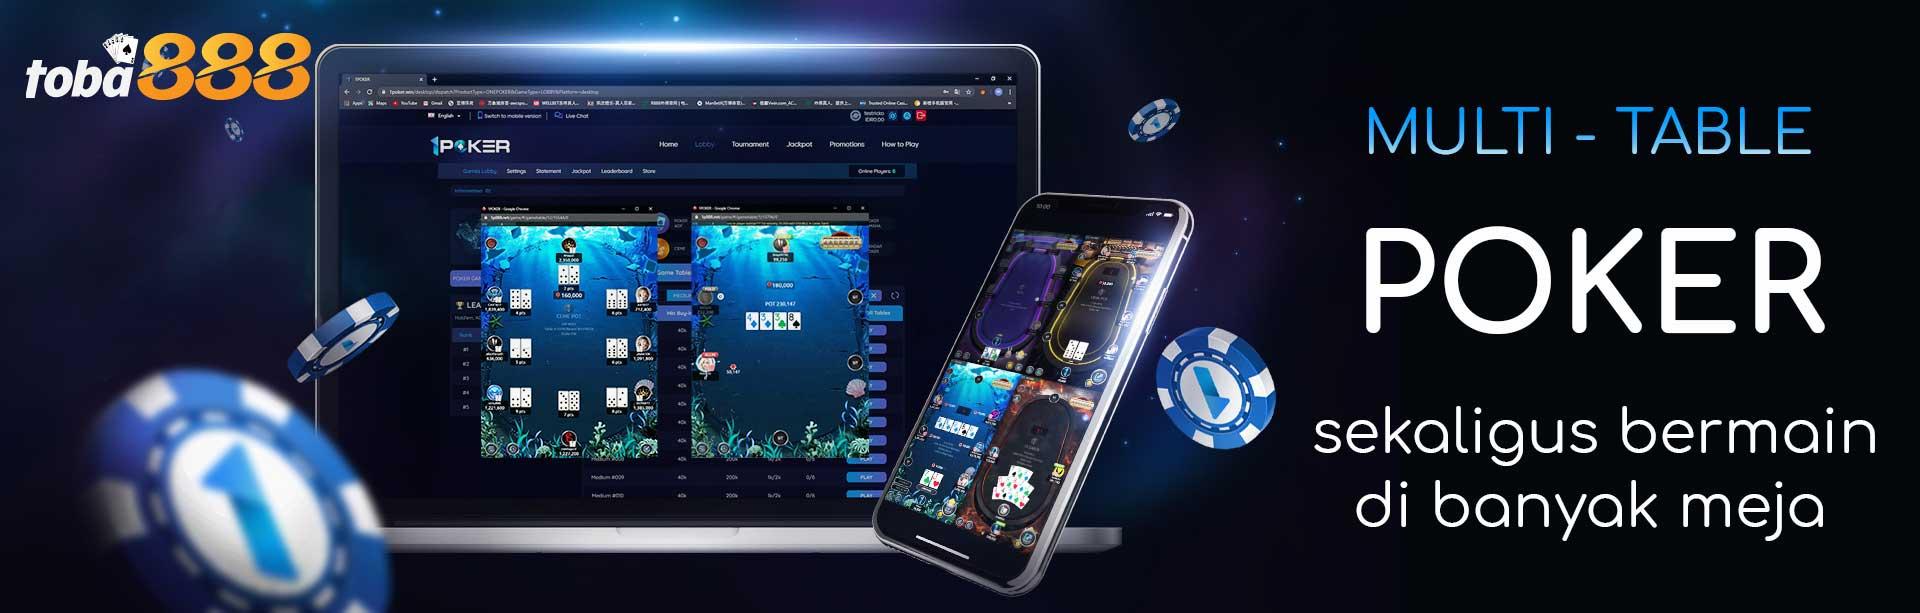 Situs Poker Online 1Gaming Terpercaya 2020